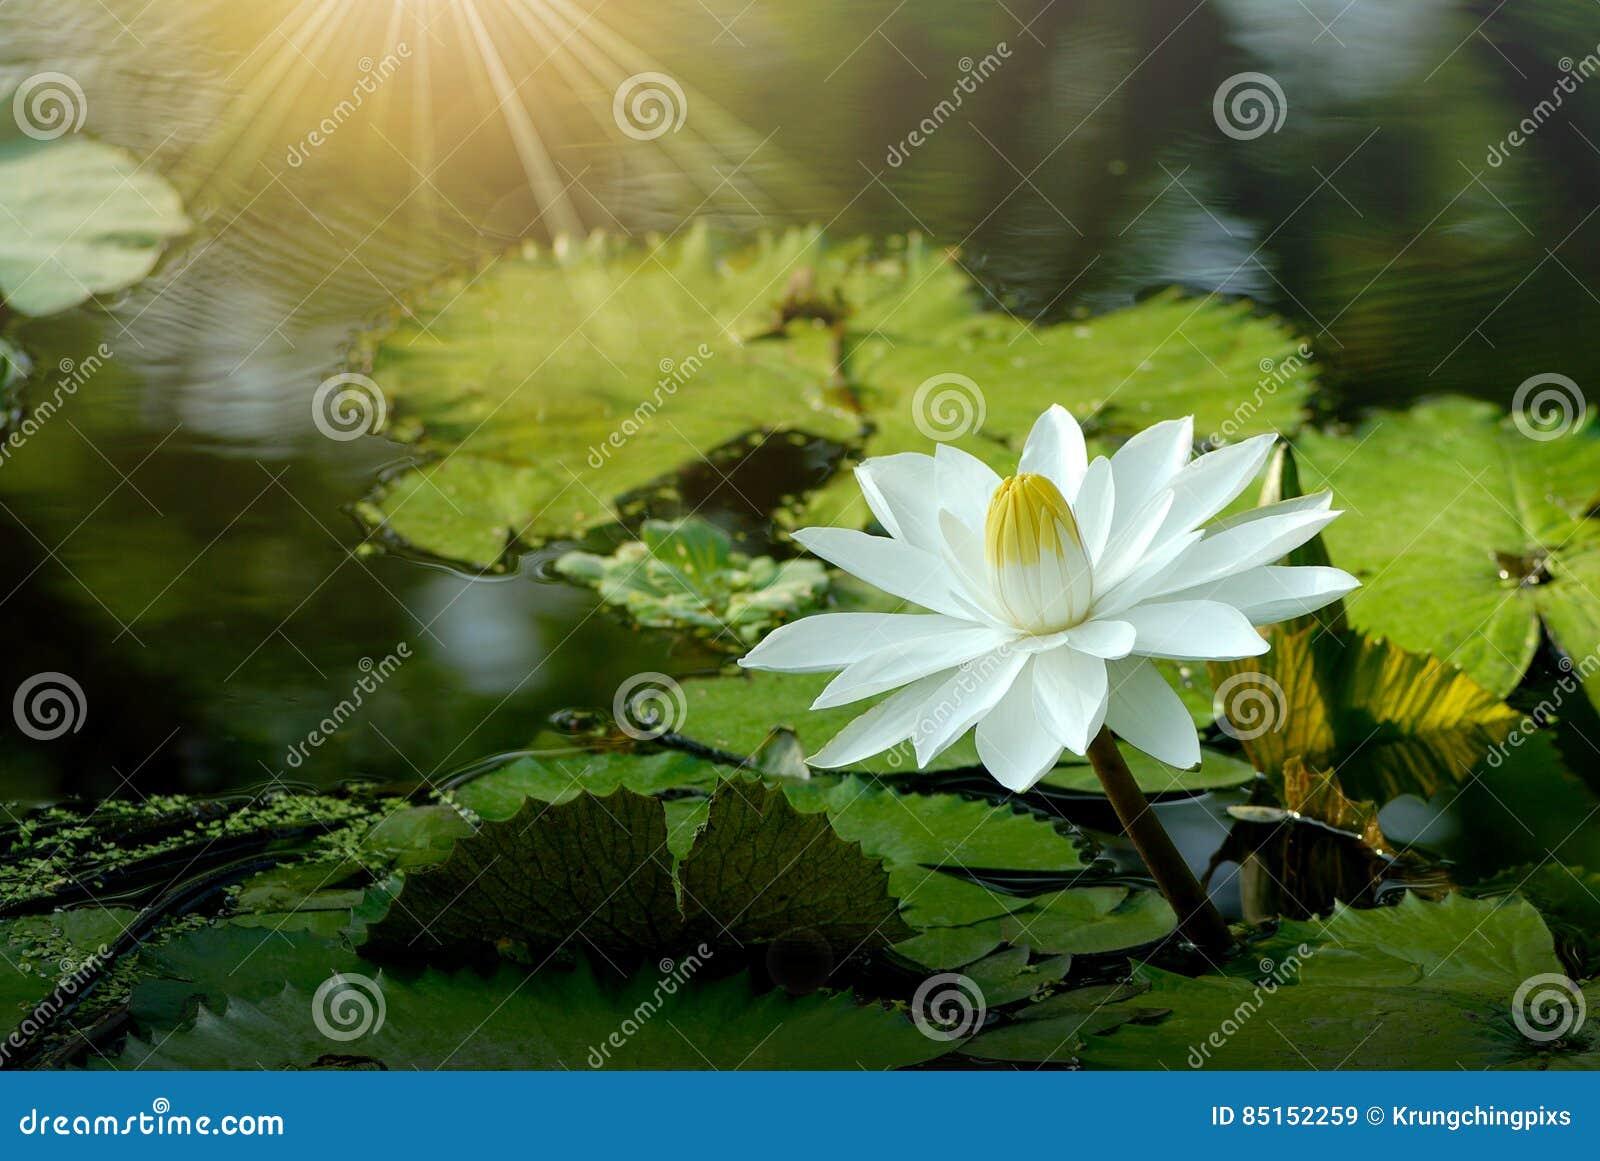 White lotus flower in the pond stock image image of closeup lotus white lotus flower in the pond izmirmasajfo